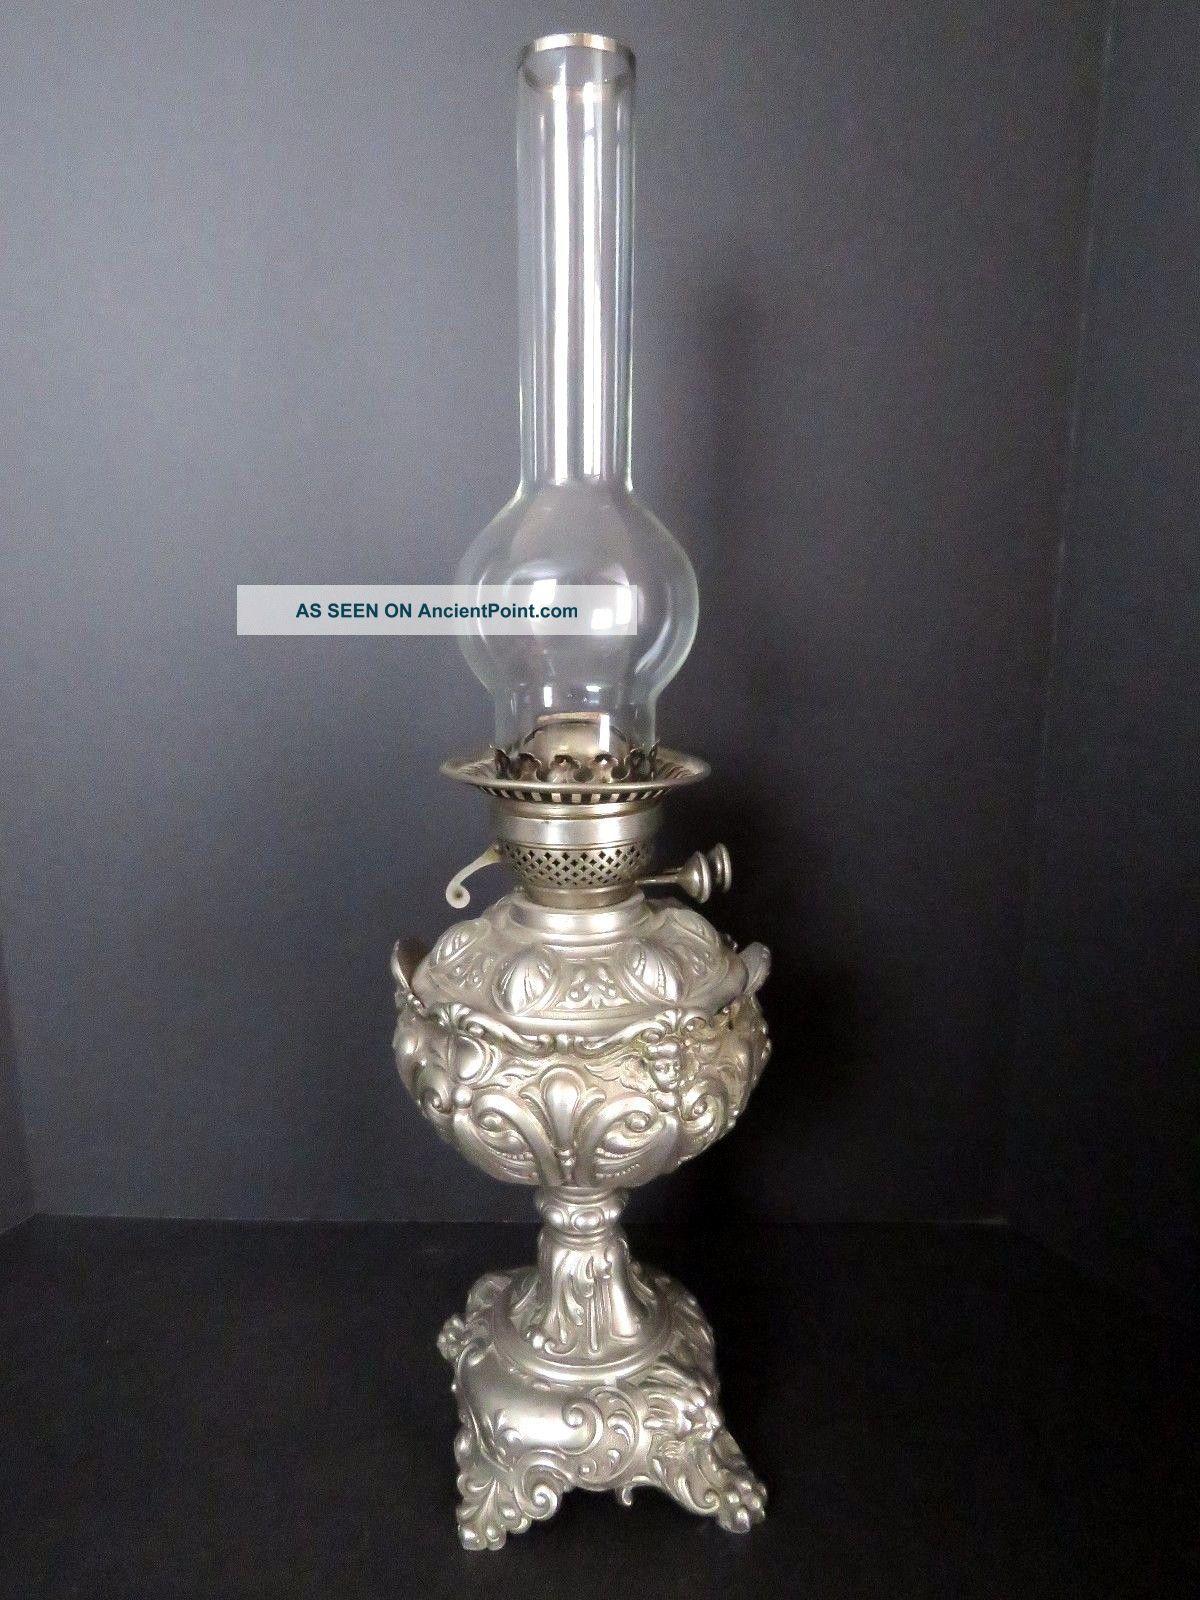 Antique Pewter German Kerosene Lamp With Glass Oil Insert. Lamps photo